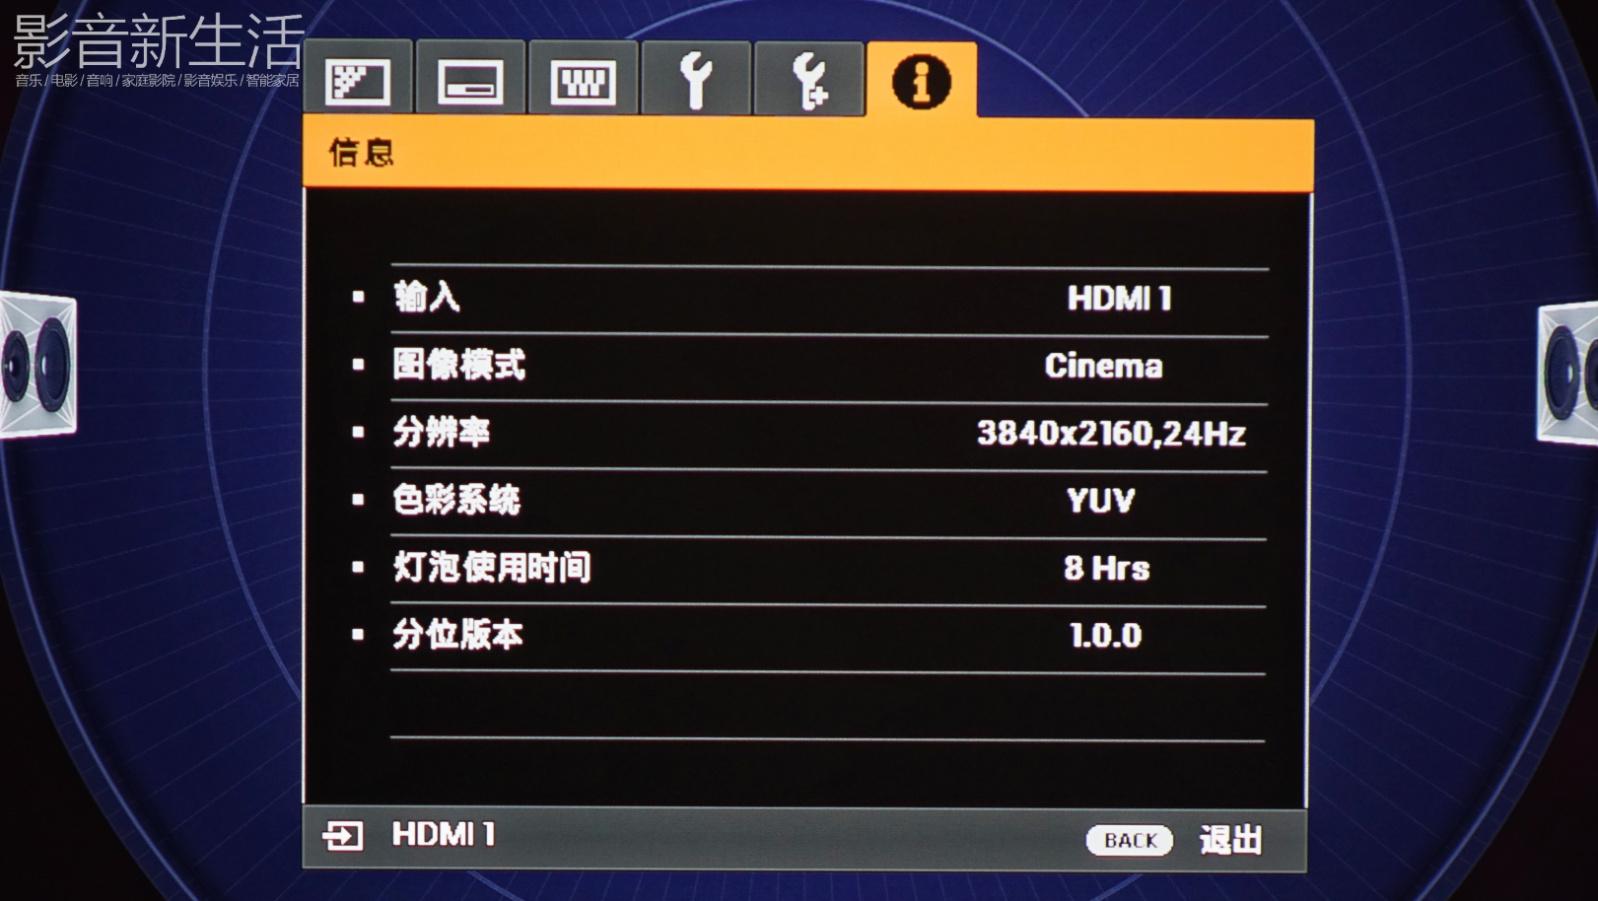 "JVC DLP UH1 Menu4 - 推荐 | ""无法抗拒的色彩诱惑,普及家用4K/UHD投影的新尝试!"" JVC DLP LX-UH1 投影机"